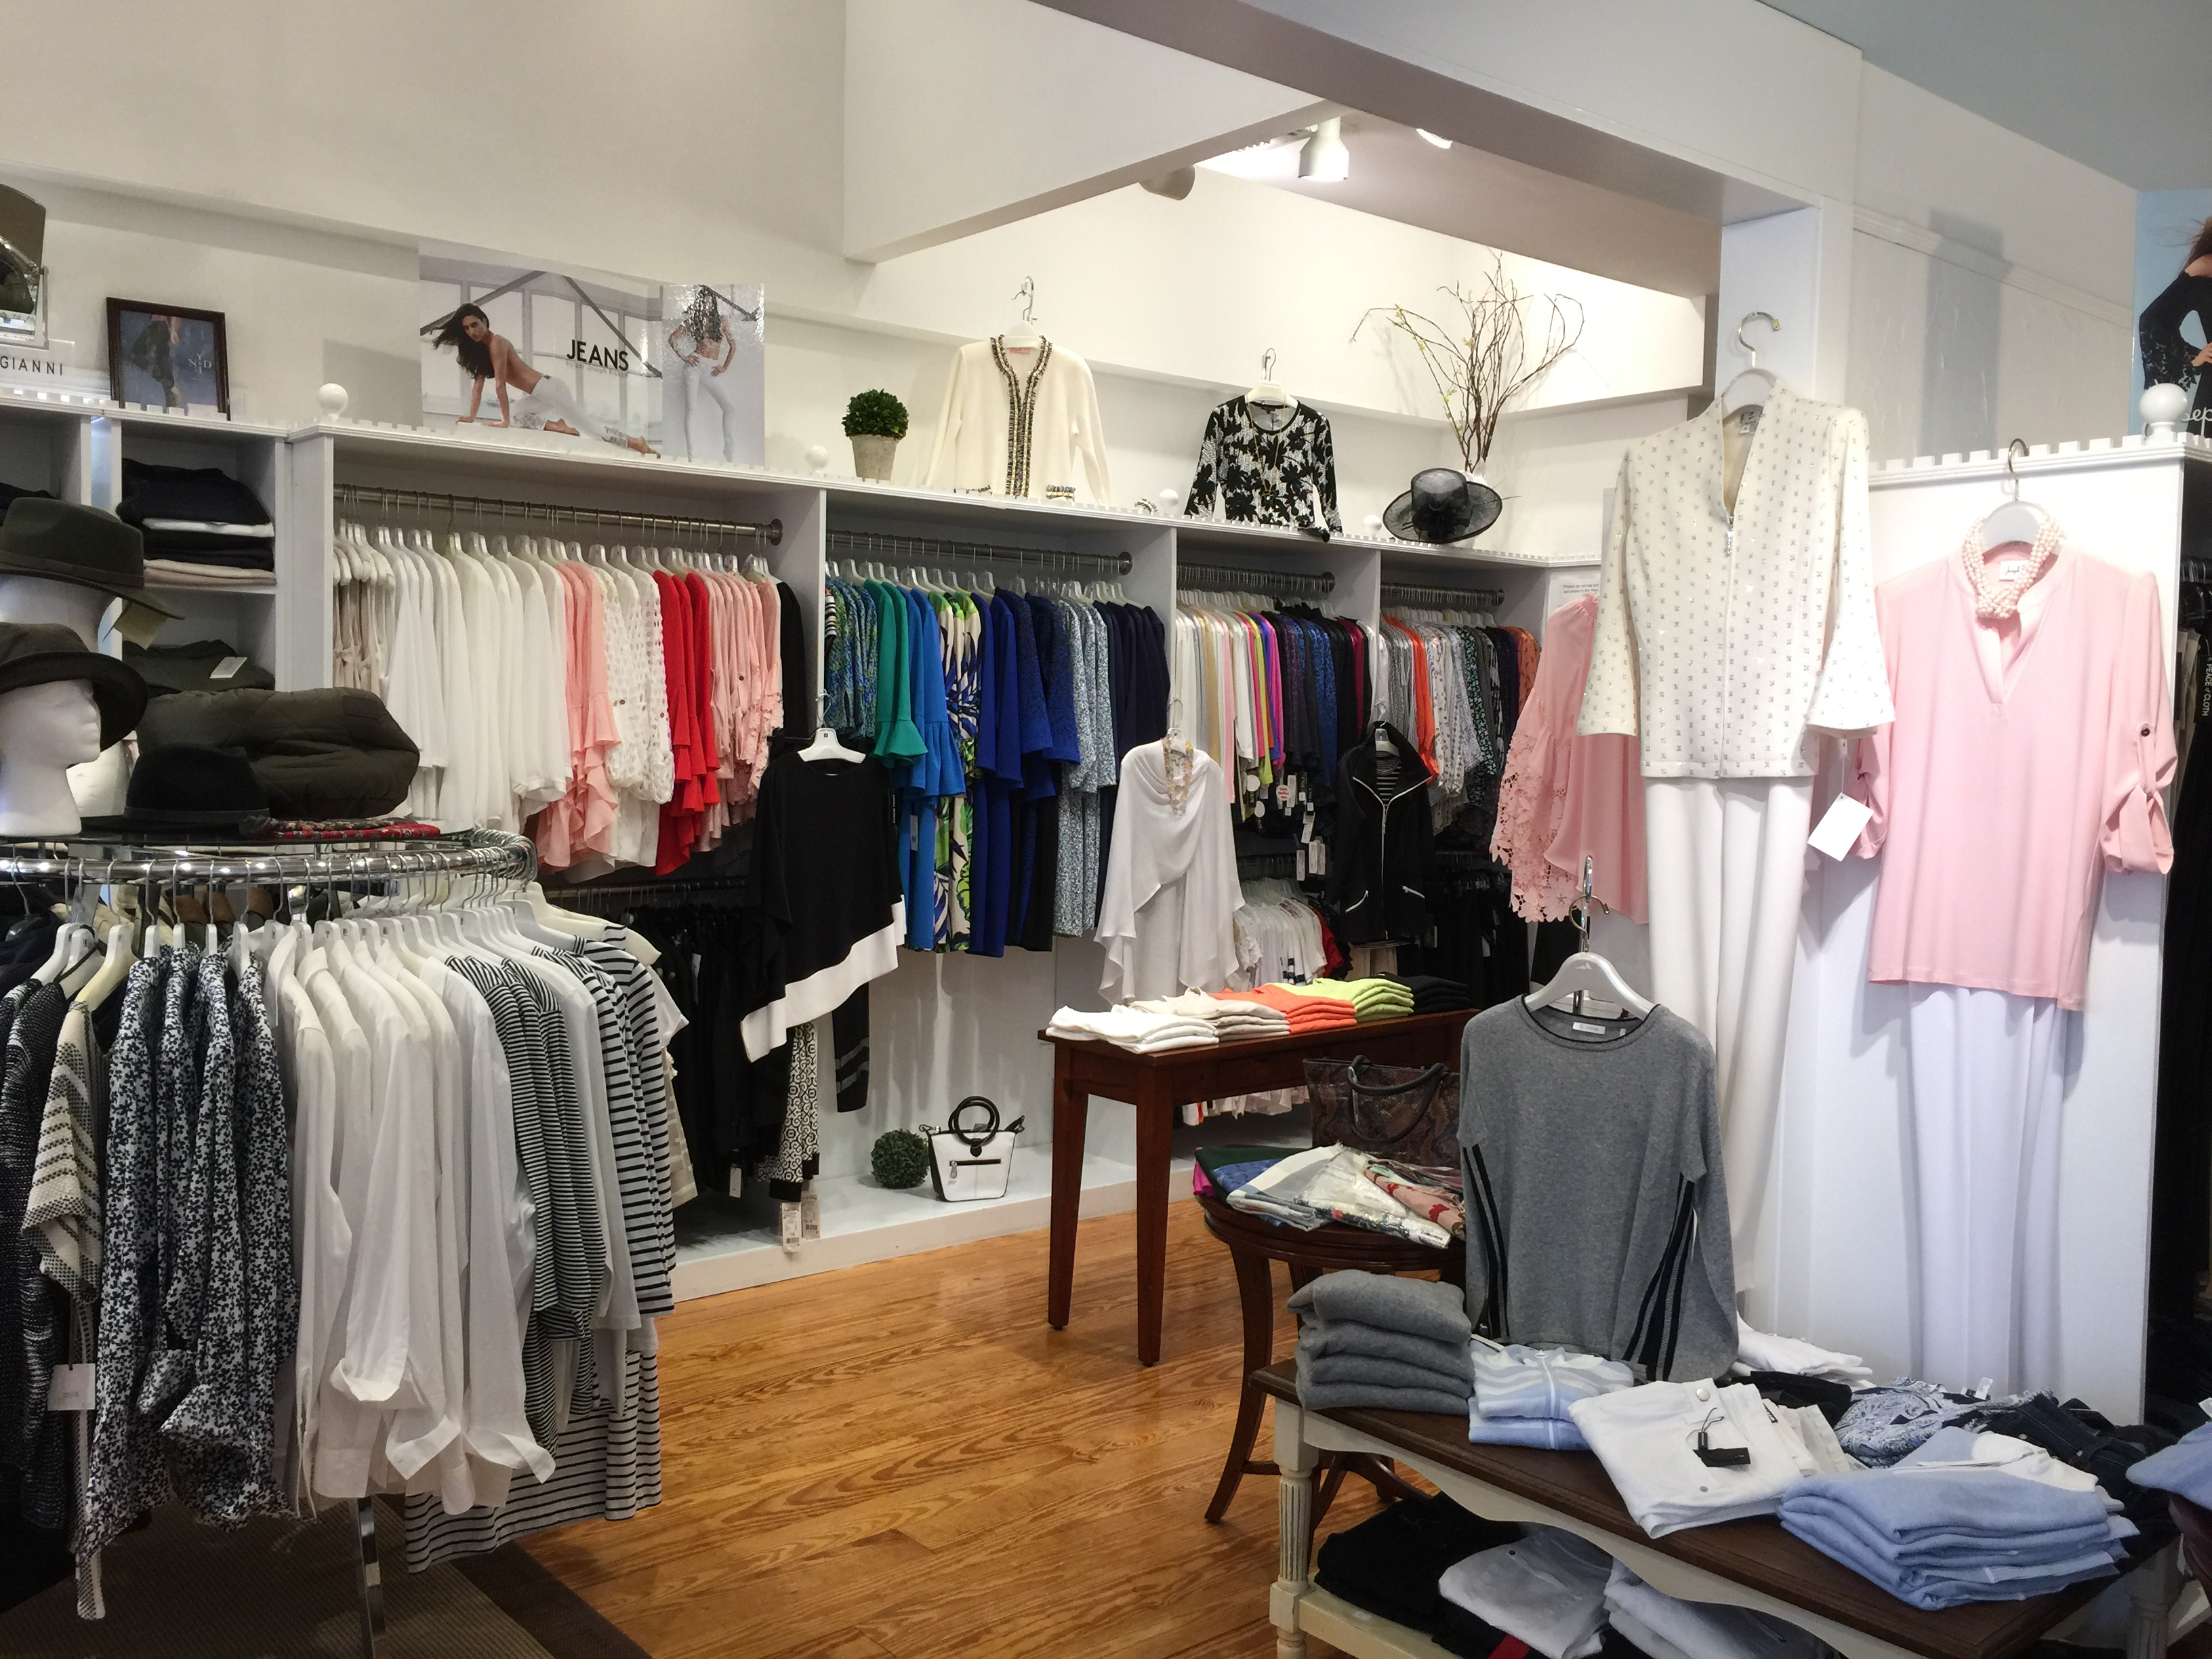 New store interior shot